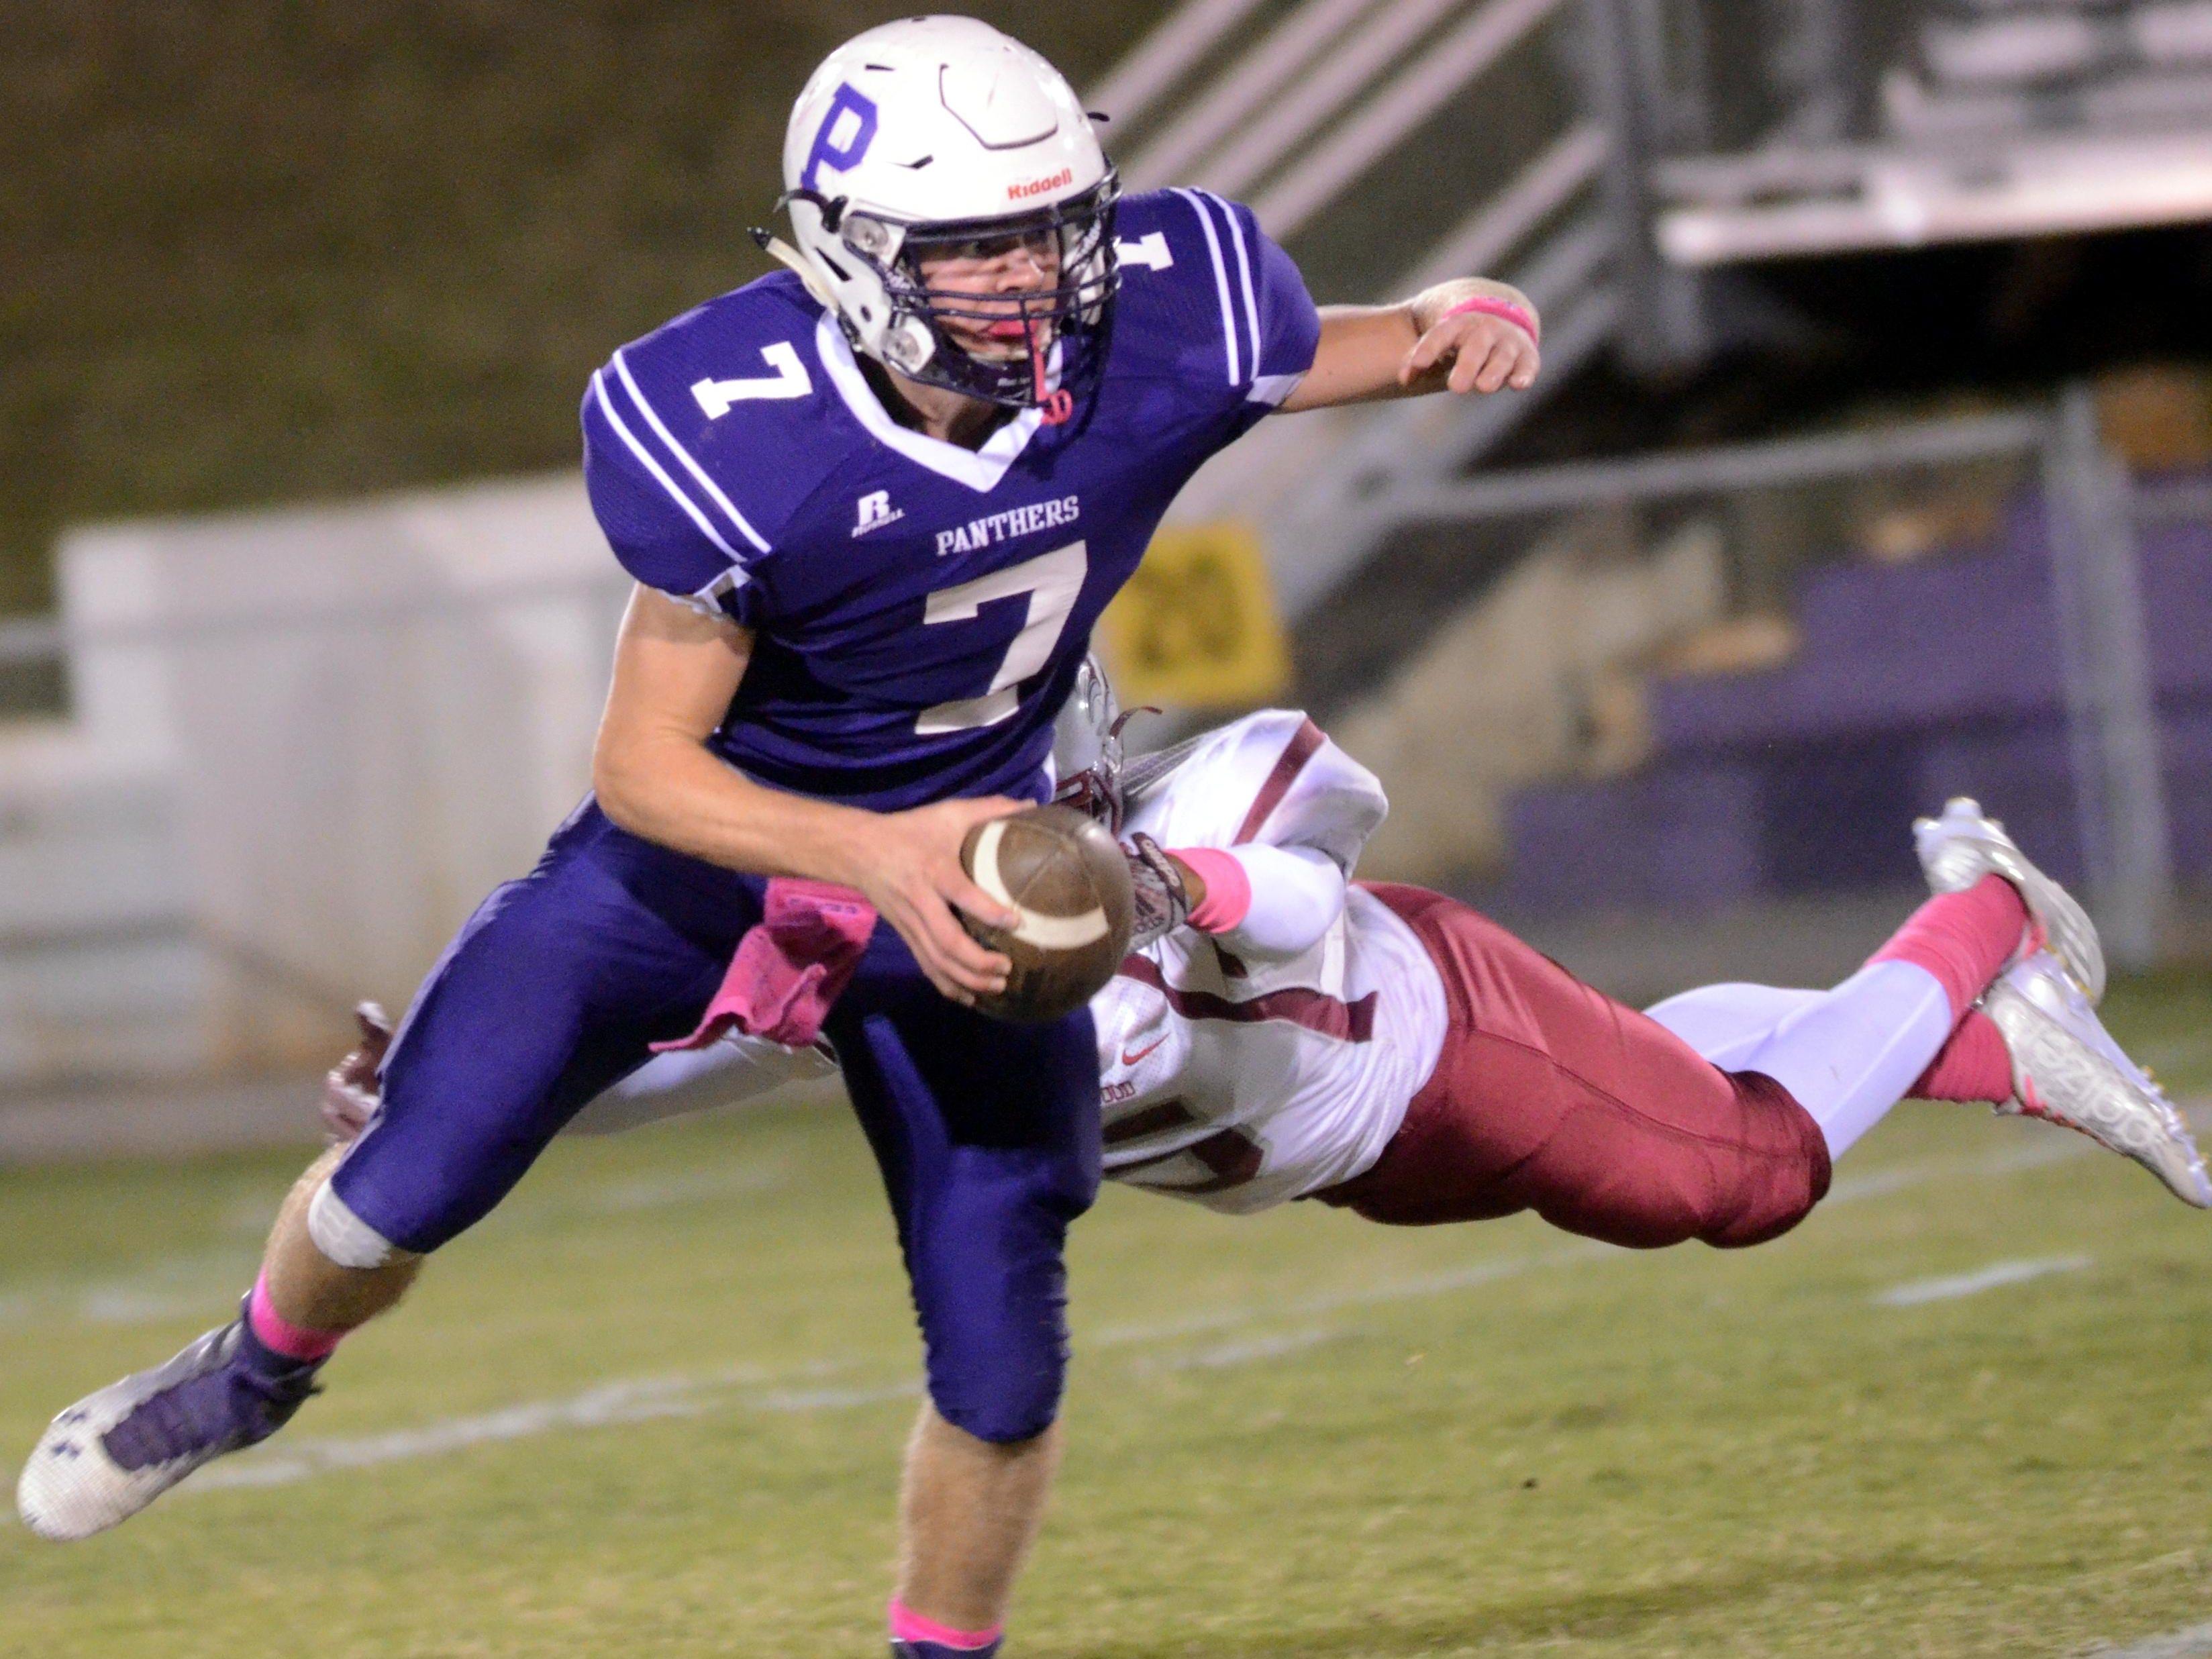 Portland High senior quarterback Ethan Brummett eludes Maplewood junior defensive back Roshawn Pointer during second-quarter action.